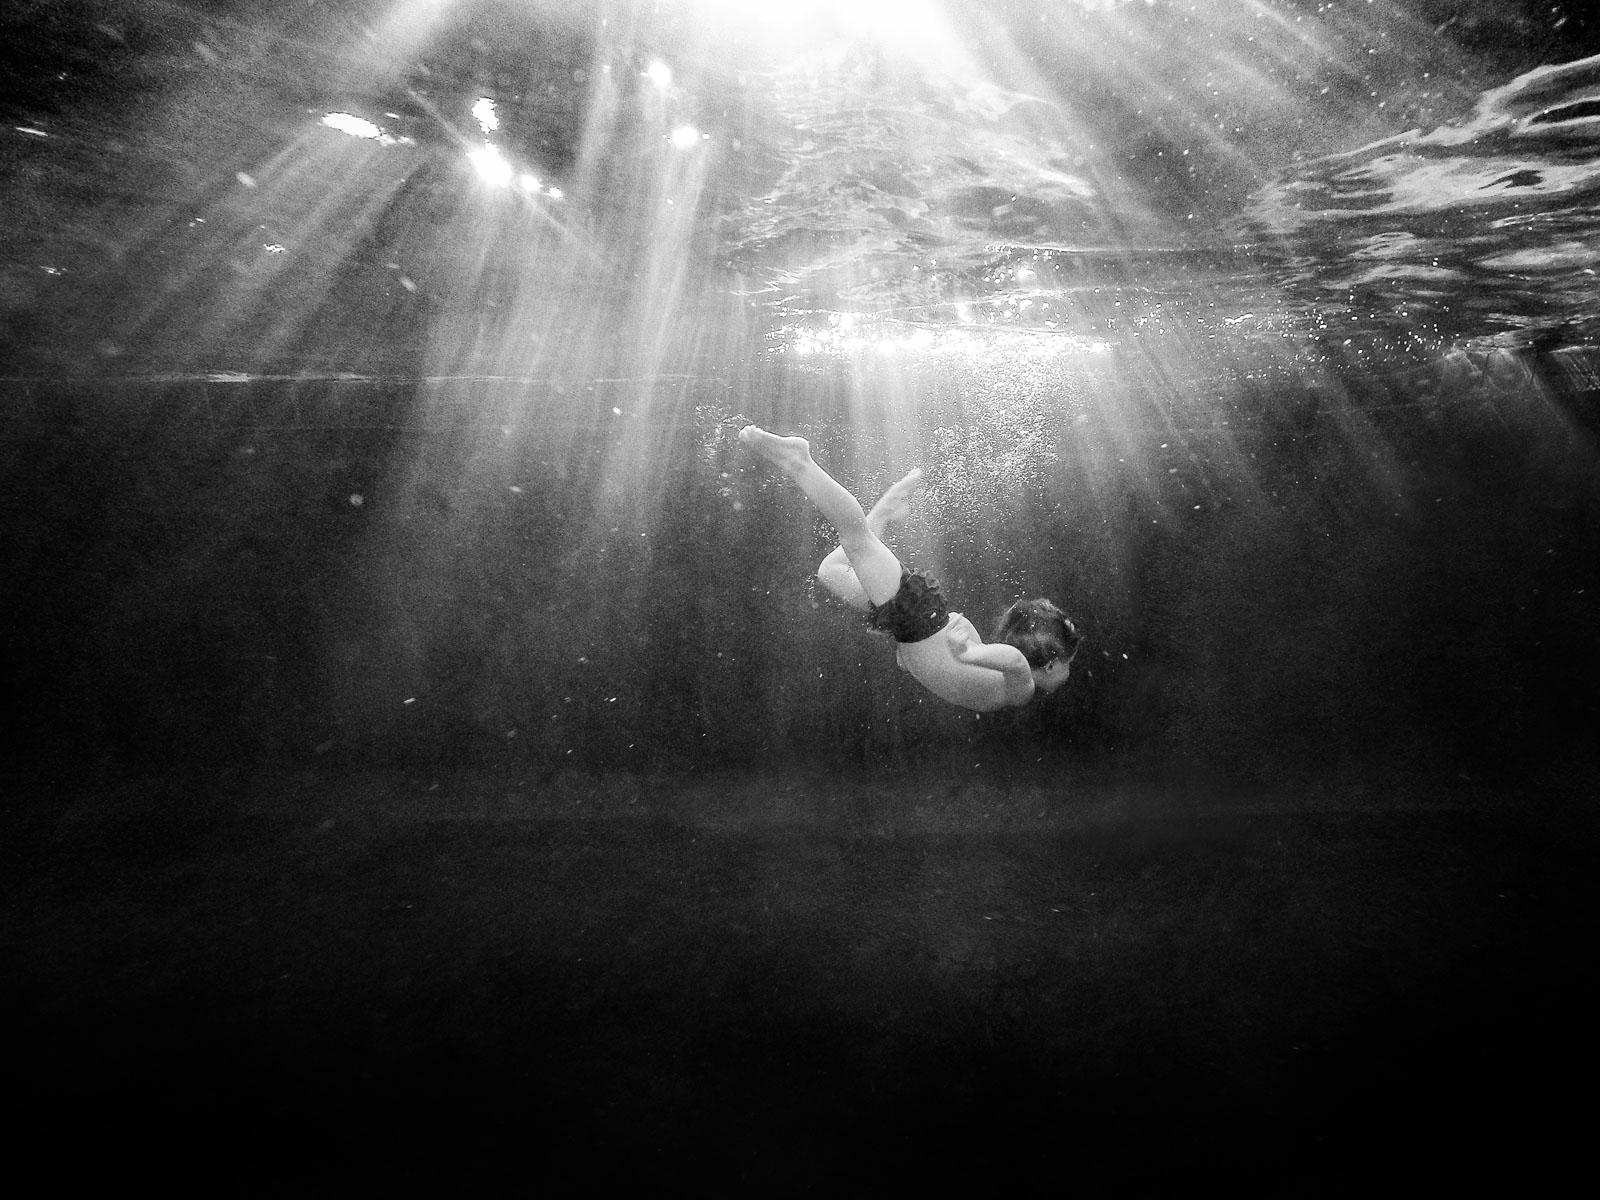 Underwater photo of boy swimming in rays of light